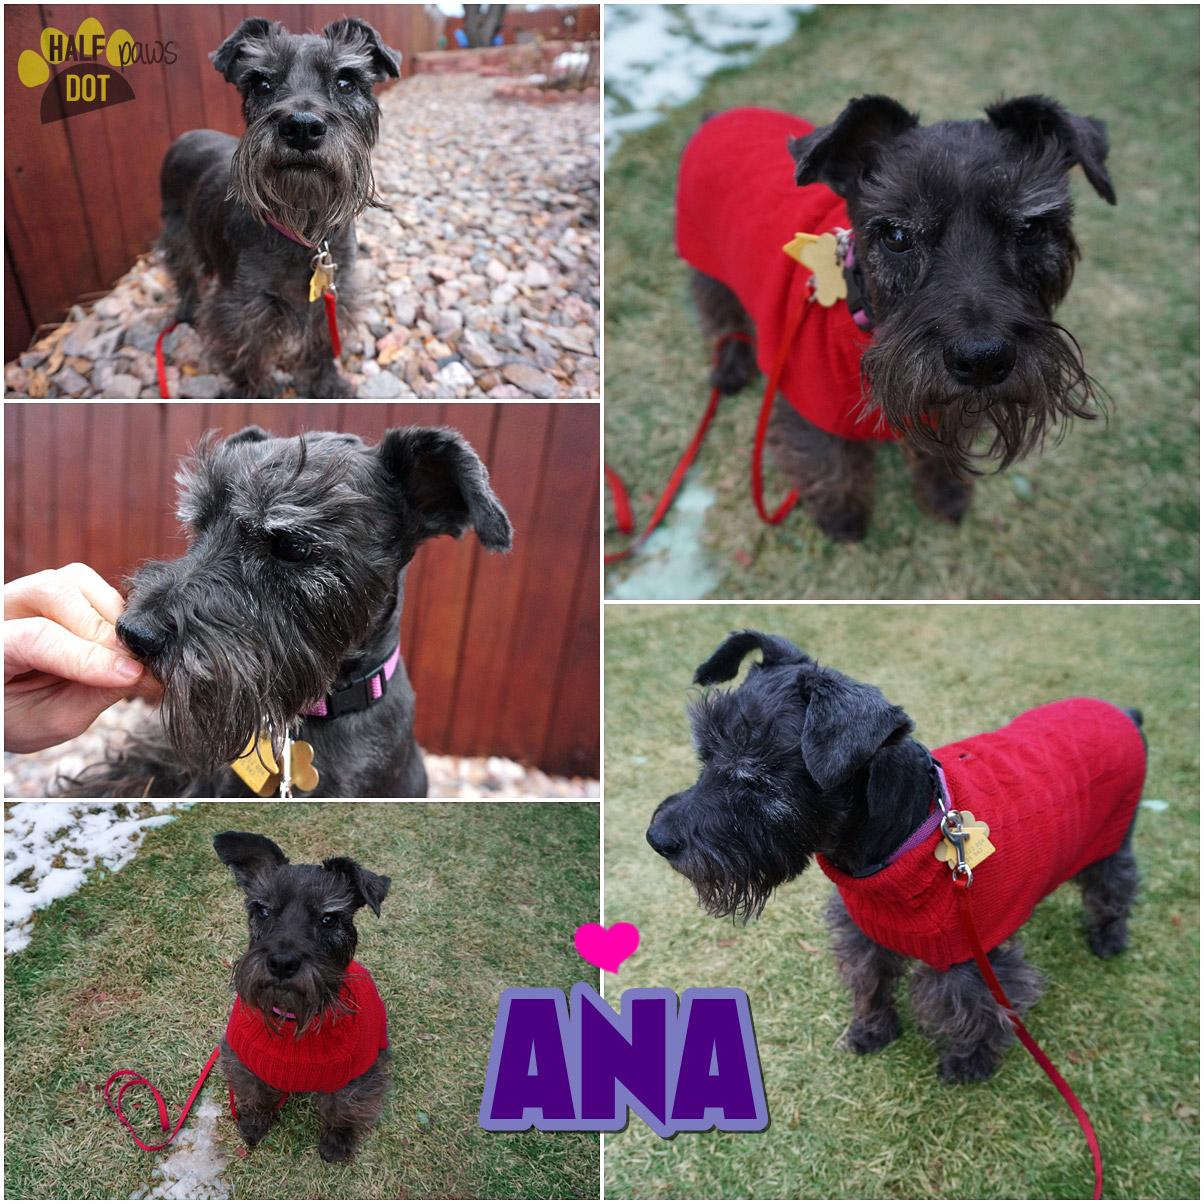 Adopt Ana: an adventuresome lady